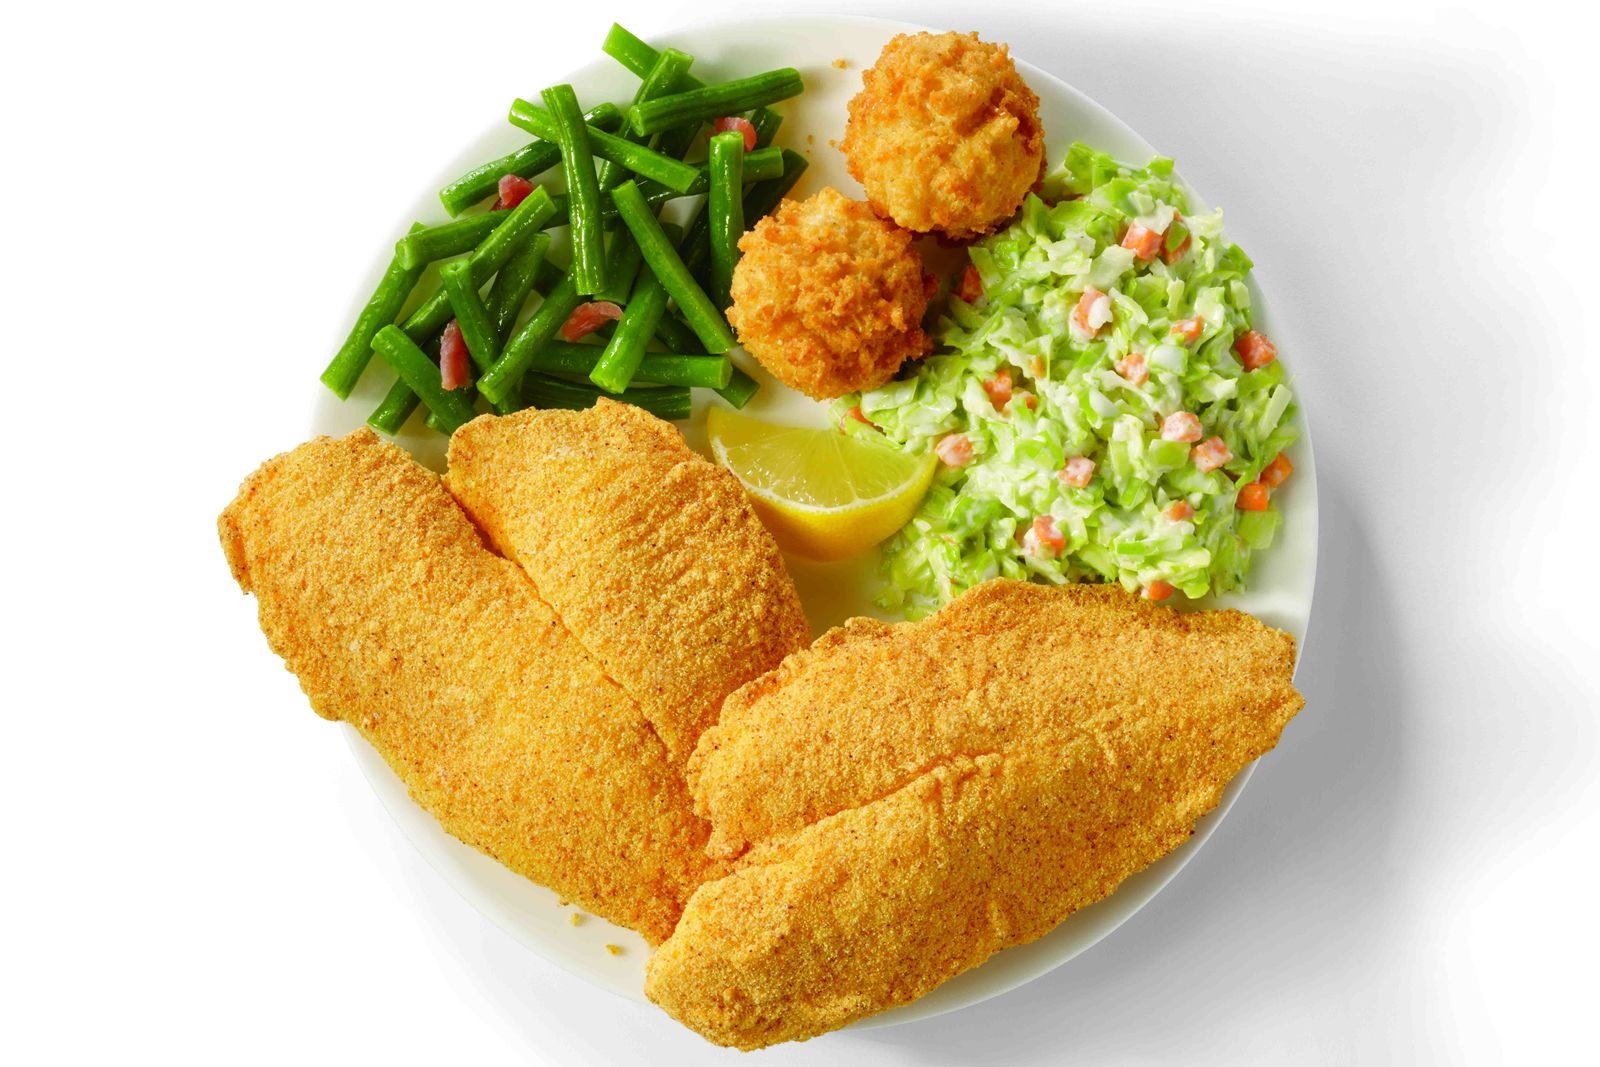 Captain D's Raises the Bar on Seafood with Flounder Feast this Lenten Season